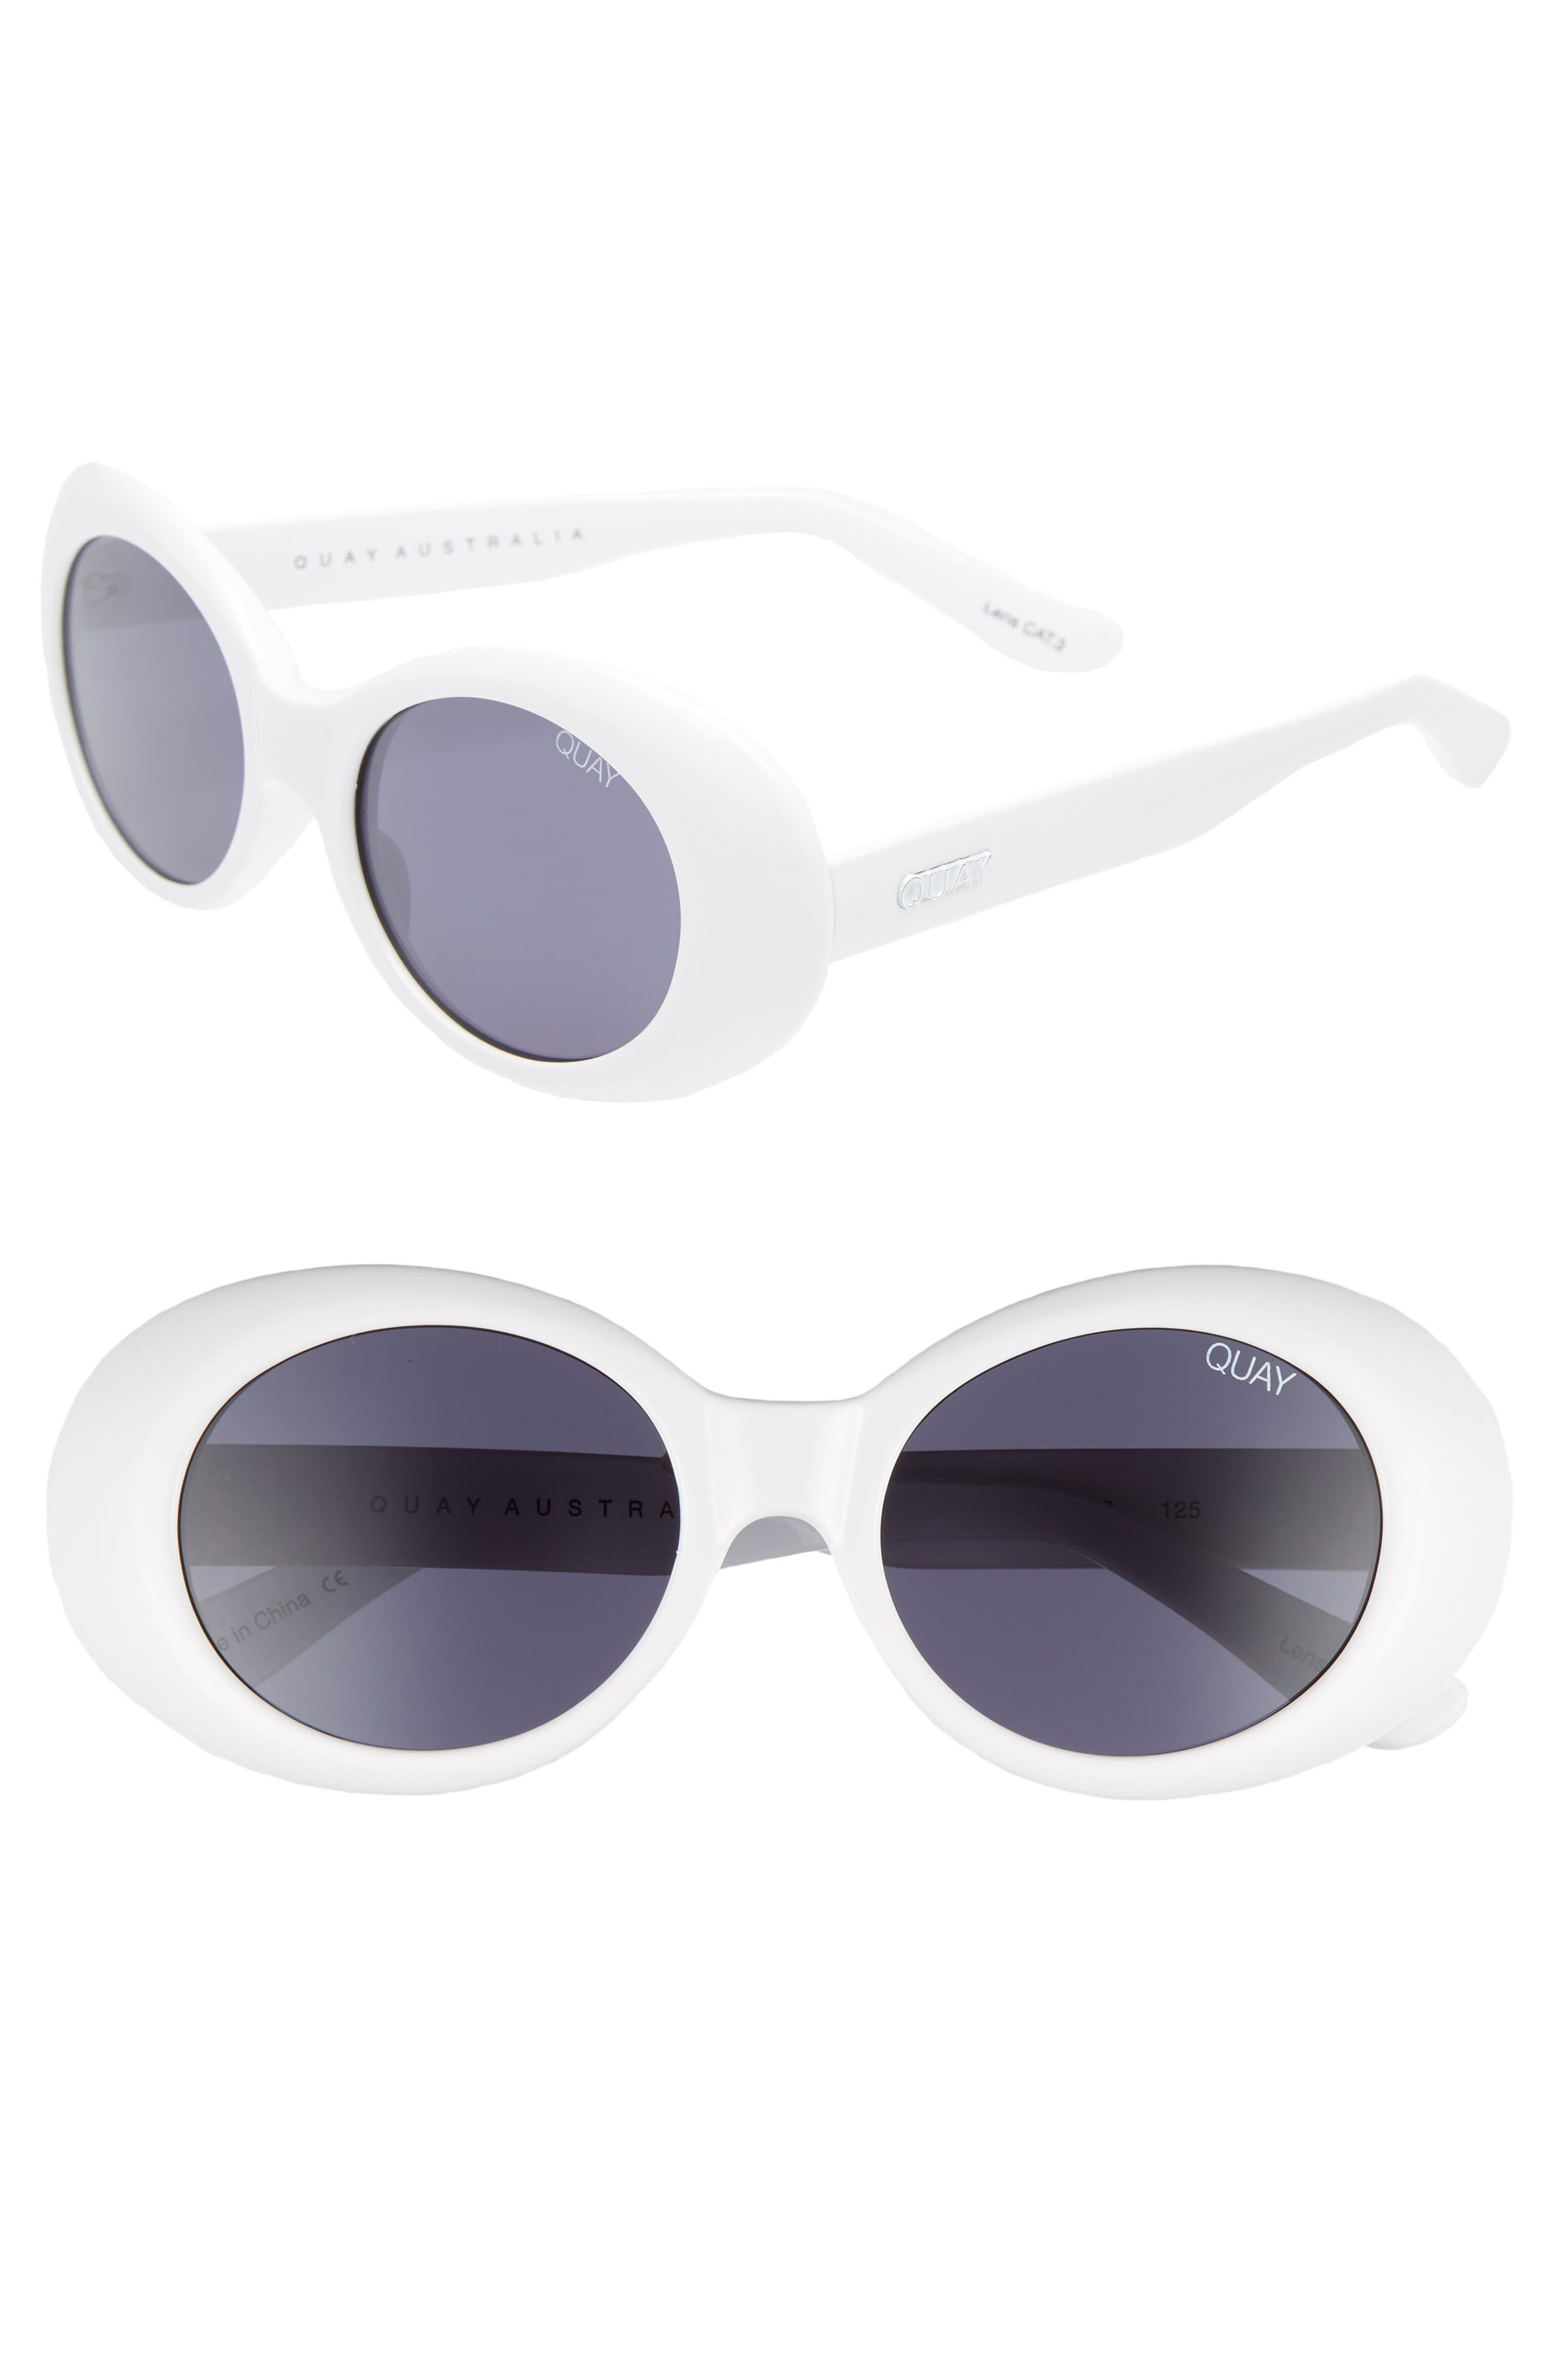 Frivolous 50mm Oval Sunglasses,                         Main,                         color, 100